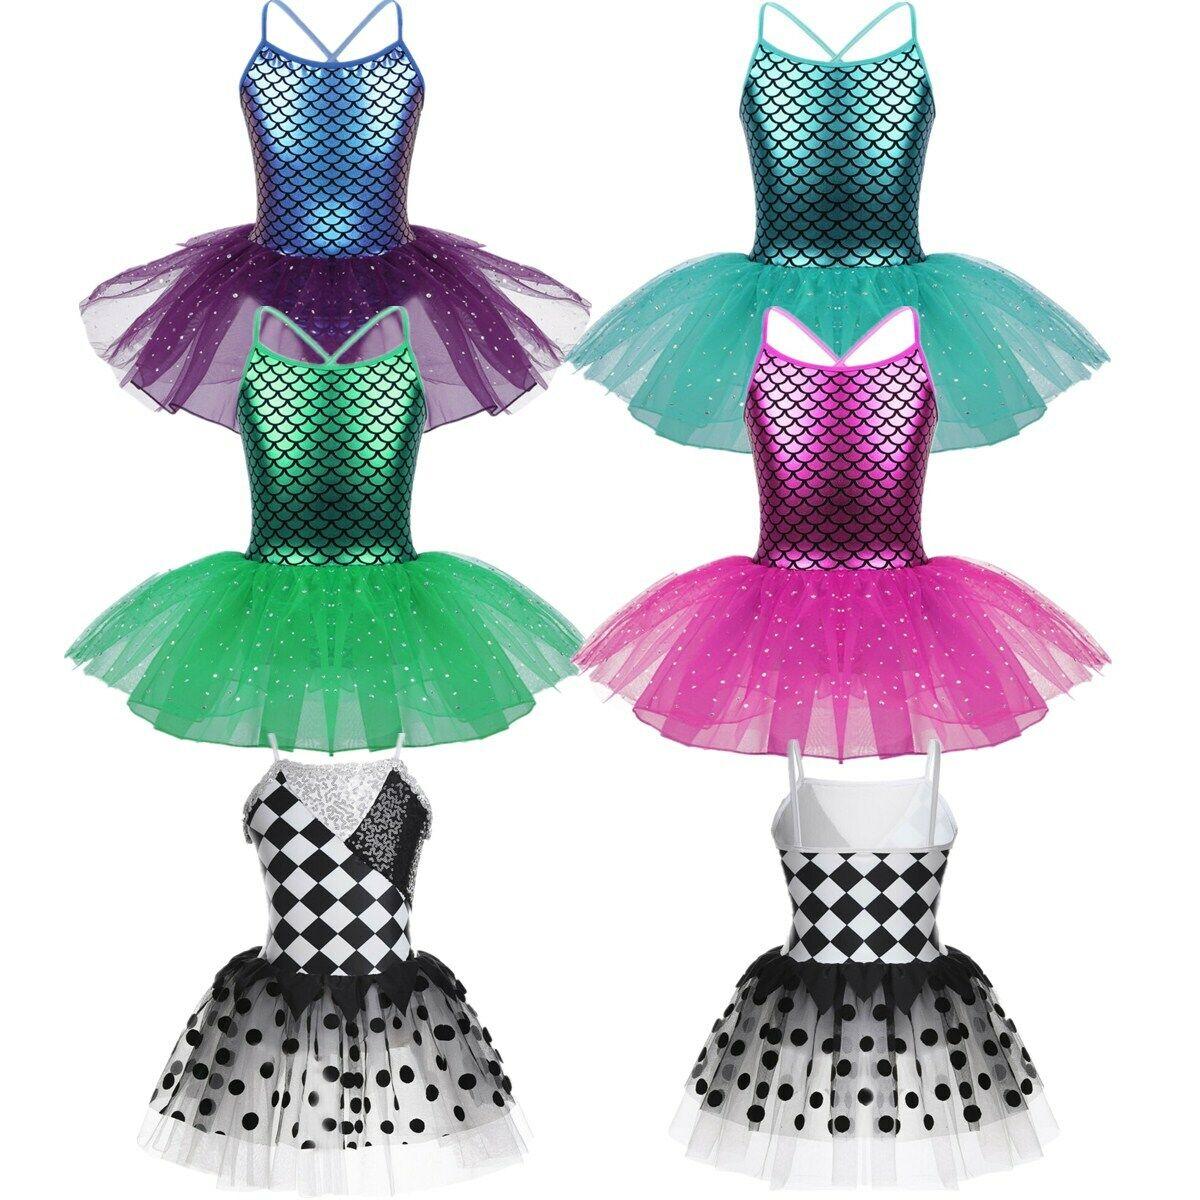 Girls Ballet Dance Tutu Dress Mermaid Ballerina Dancewear Gymnastics Leotards